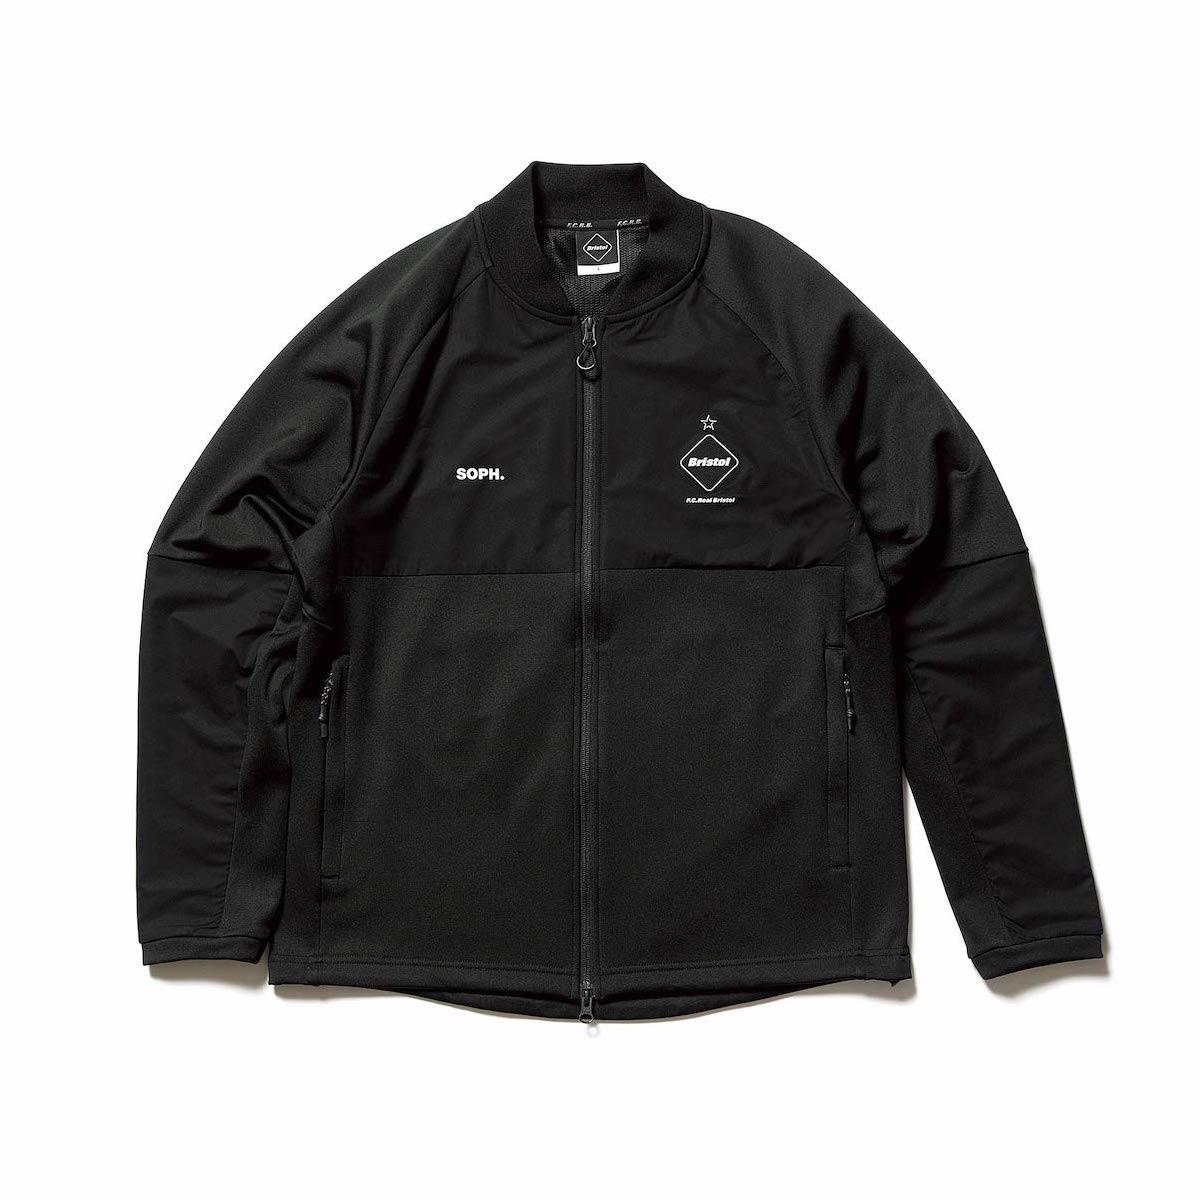 F.C.Real Bristol / PDK JACKET (Black)